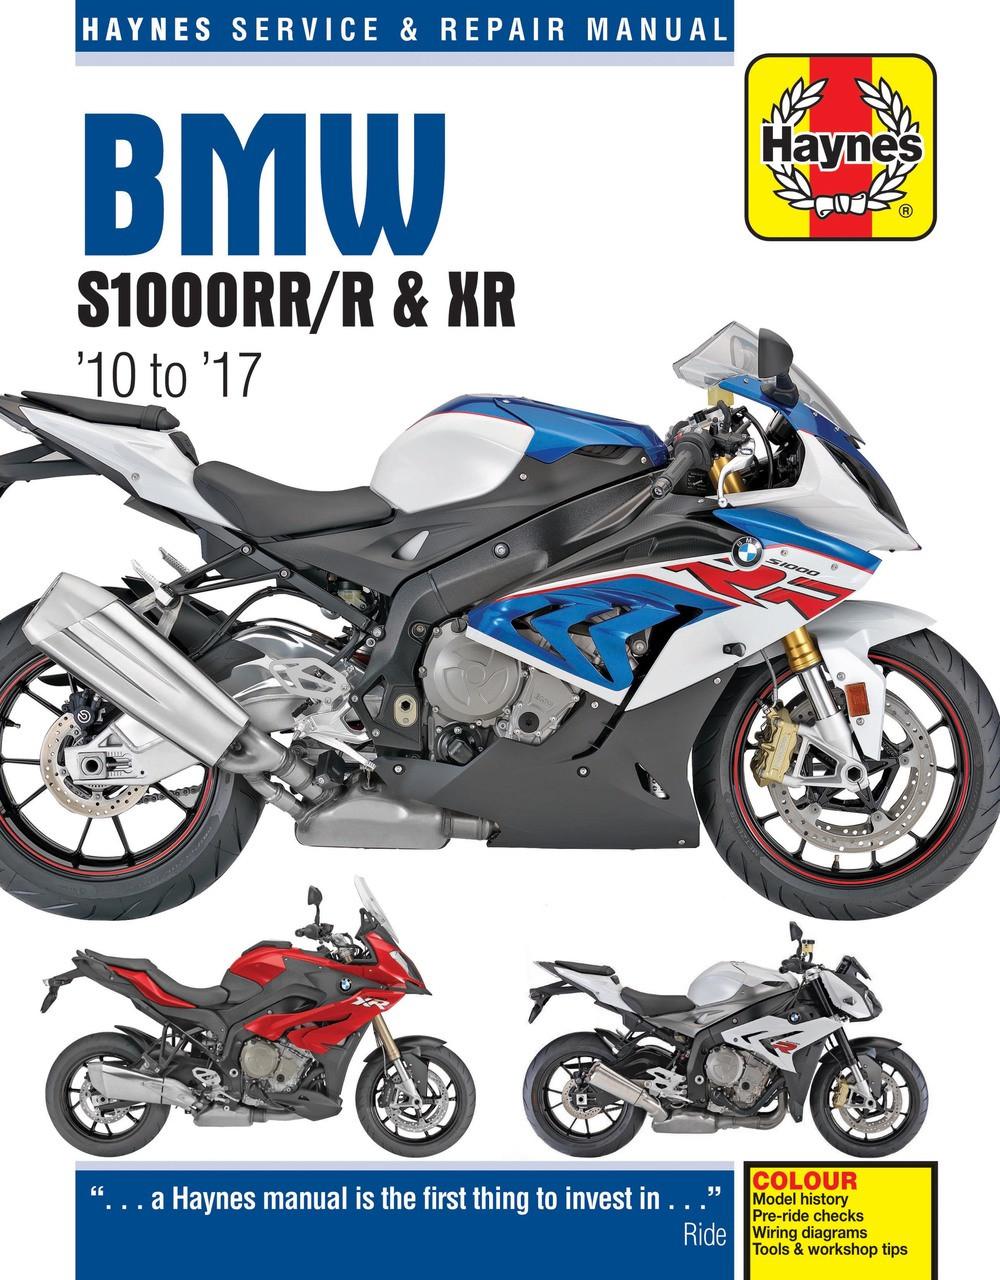 bmw s1000rr s1000r s1000xr 2010 2017 workshop manual rh automotobookshop com au 2007 BMW R1200RT 2016 BMW R1200RT